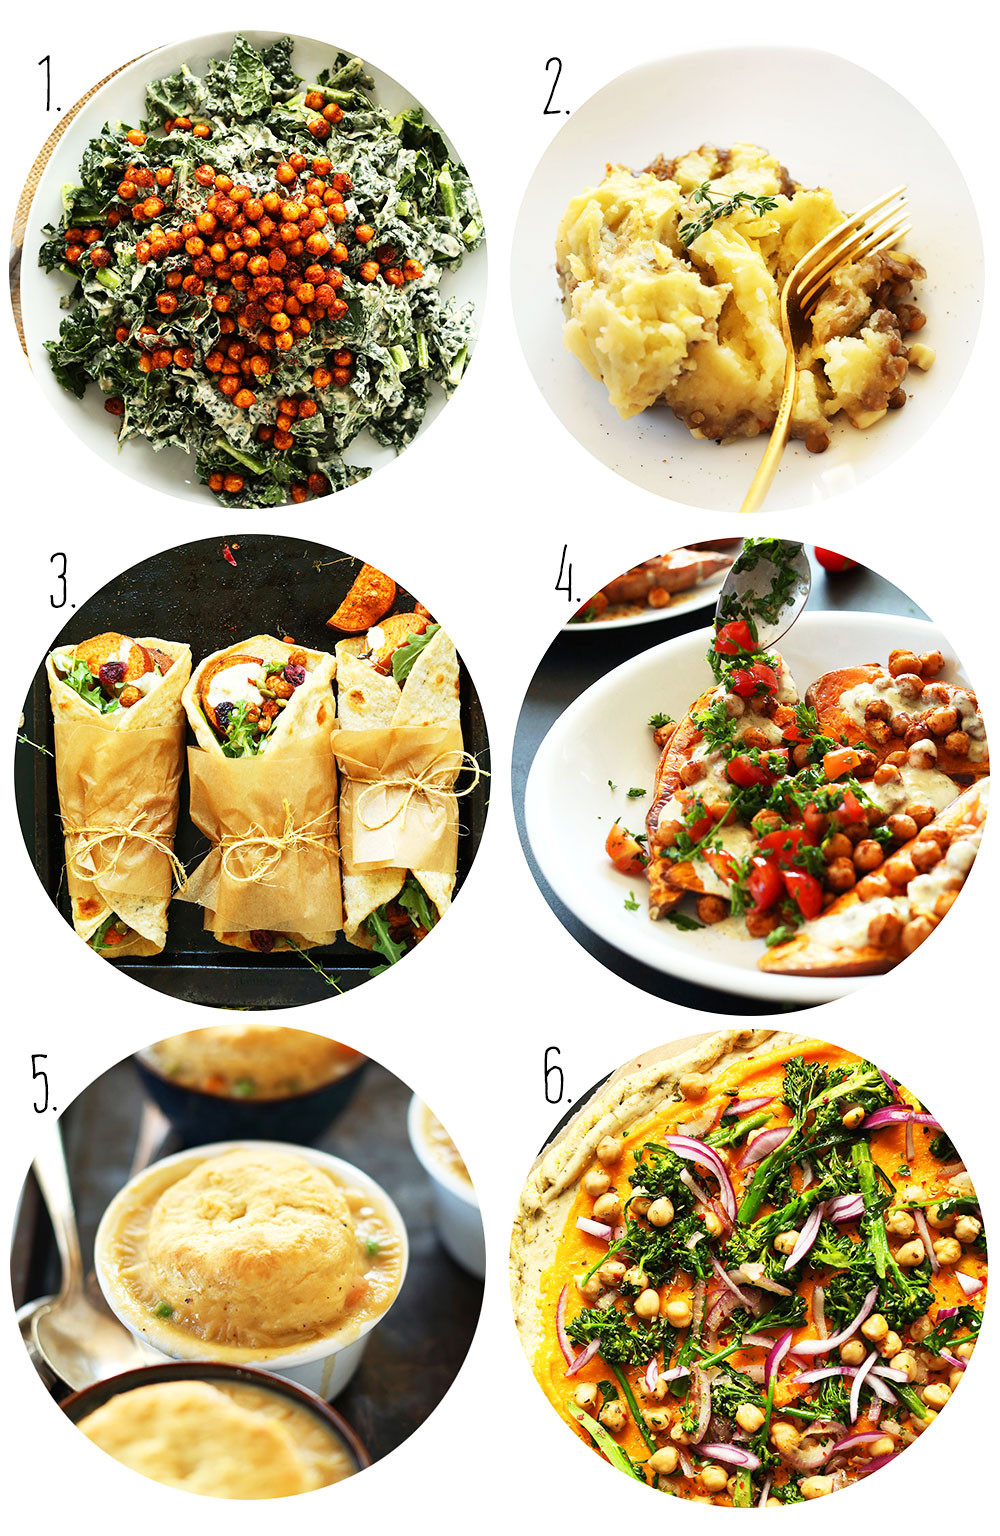 Vegan Meals For Thanksgiving  Vegan Thanksgiving Recipes